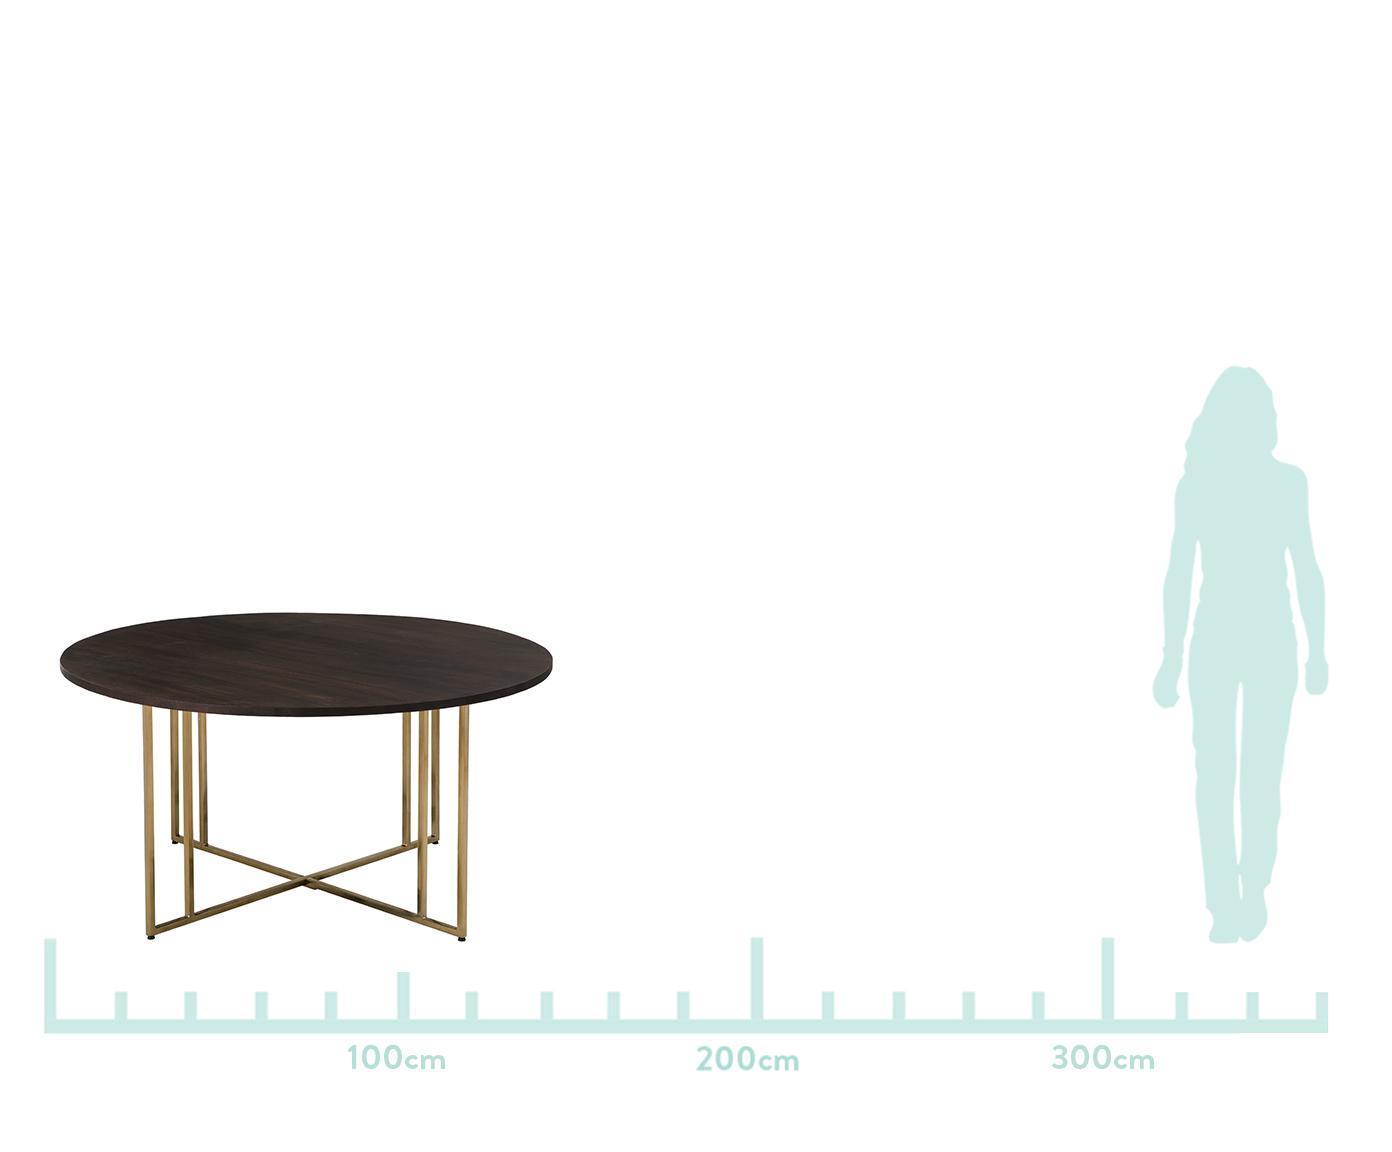 Rond massief houten eettafel Luca, Tafelblad: mangohout, Frame: gecoat metaal, Tafelblad: donker gelakt mangohout. Frame: goudkleurig, Ø 140 x H 75 cm